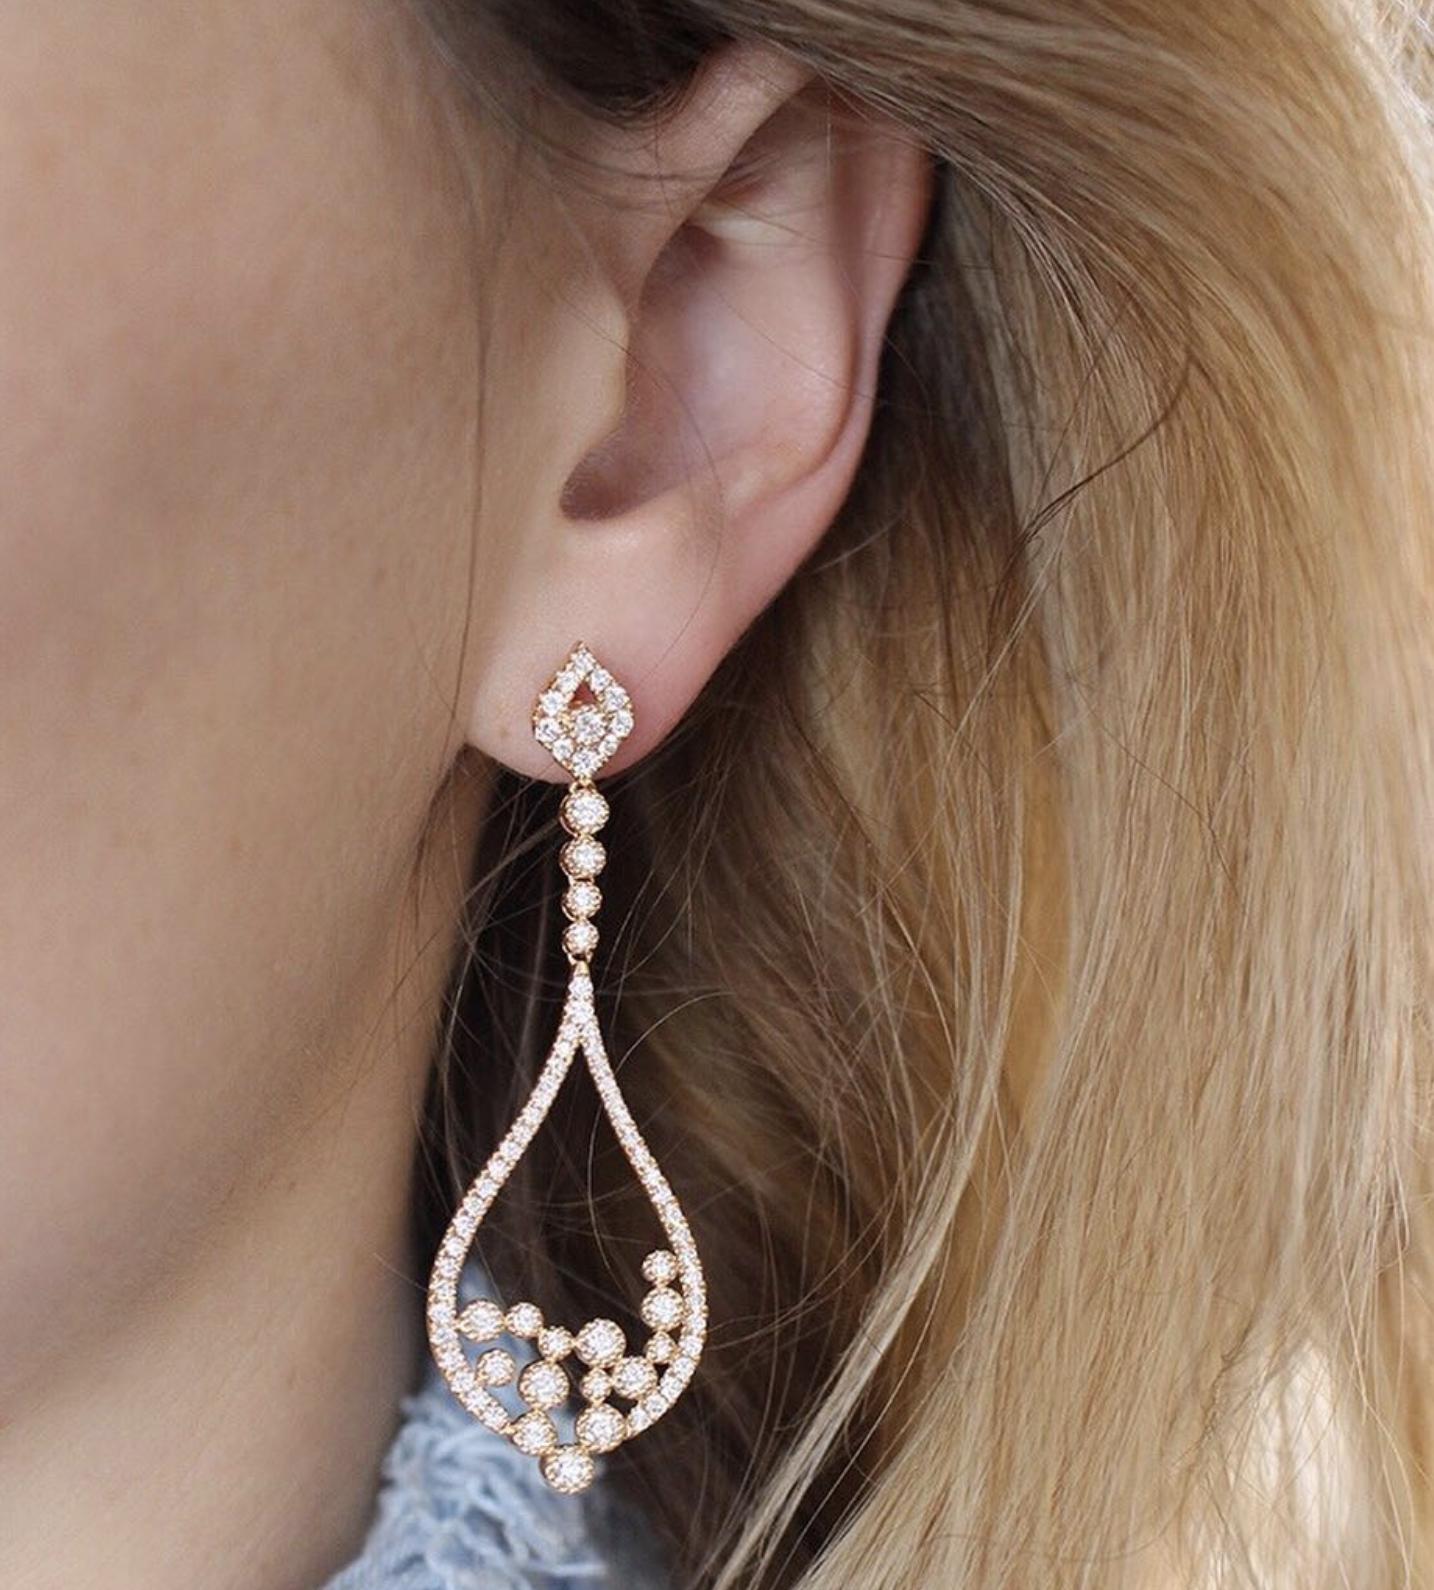 Sara Weinstock Jewelry - Brut Overflow Earrings - 18k gold and White Diamonds